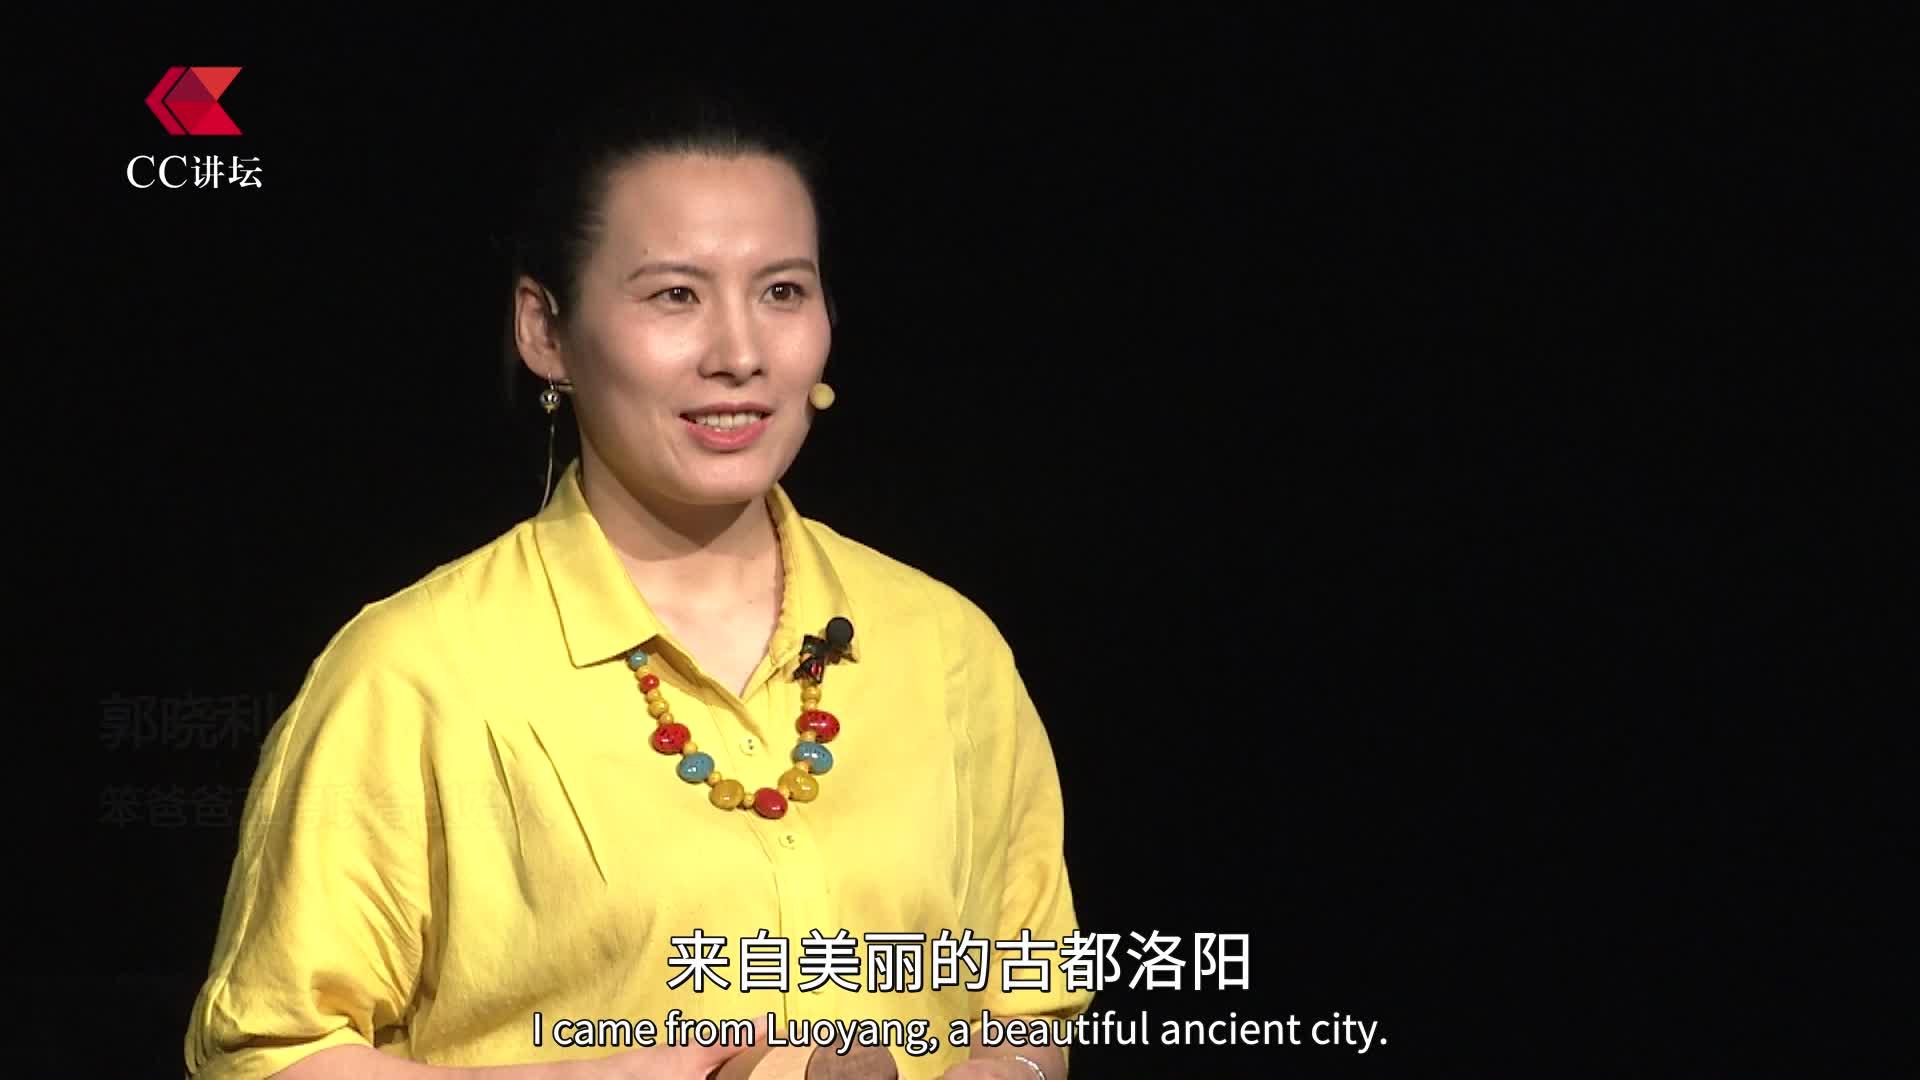 CC讲坛——郭晓利:触手可及的父爱,让影子爸爸回家